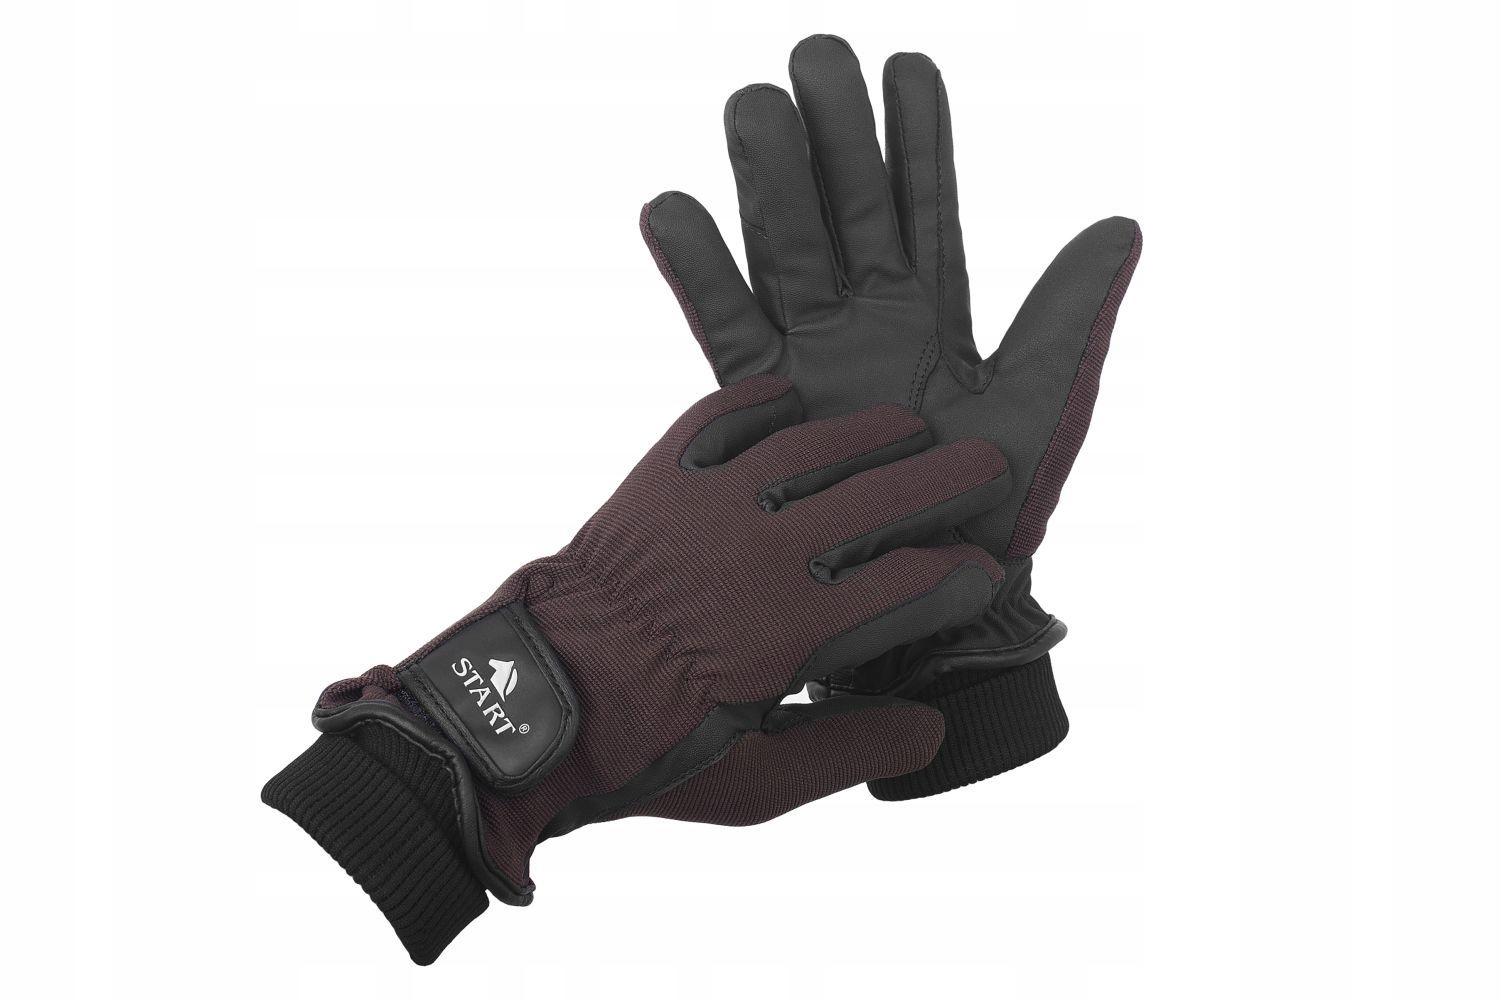 Zimné rukavice Začiatok Foundland Grip - Browns XS